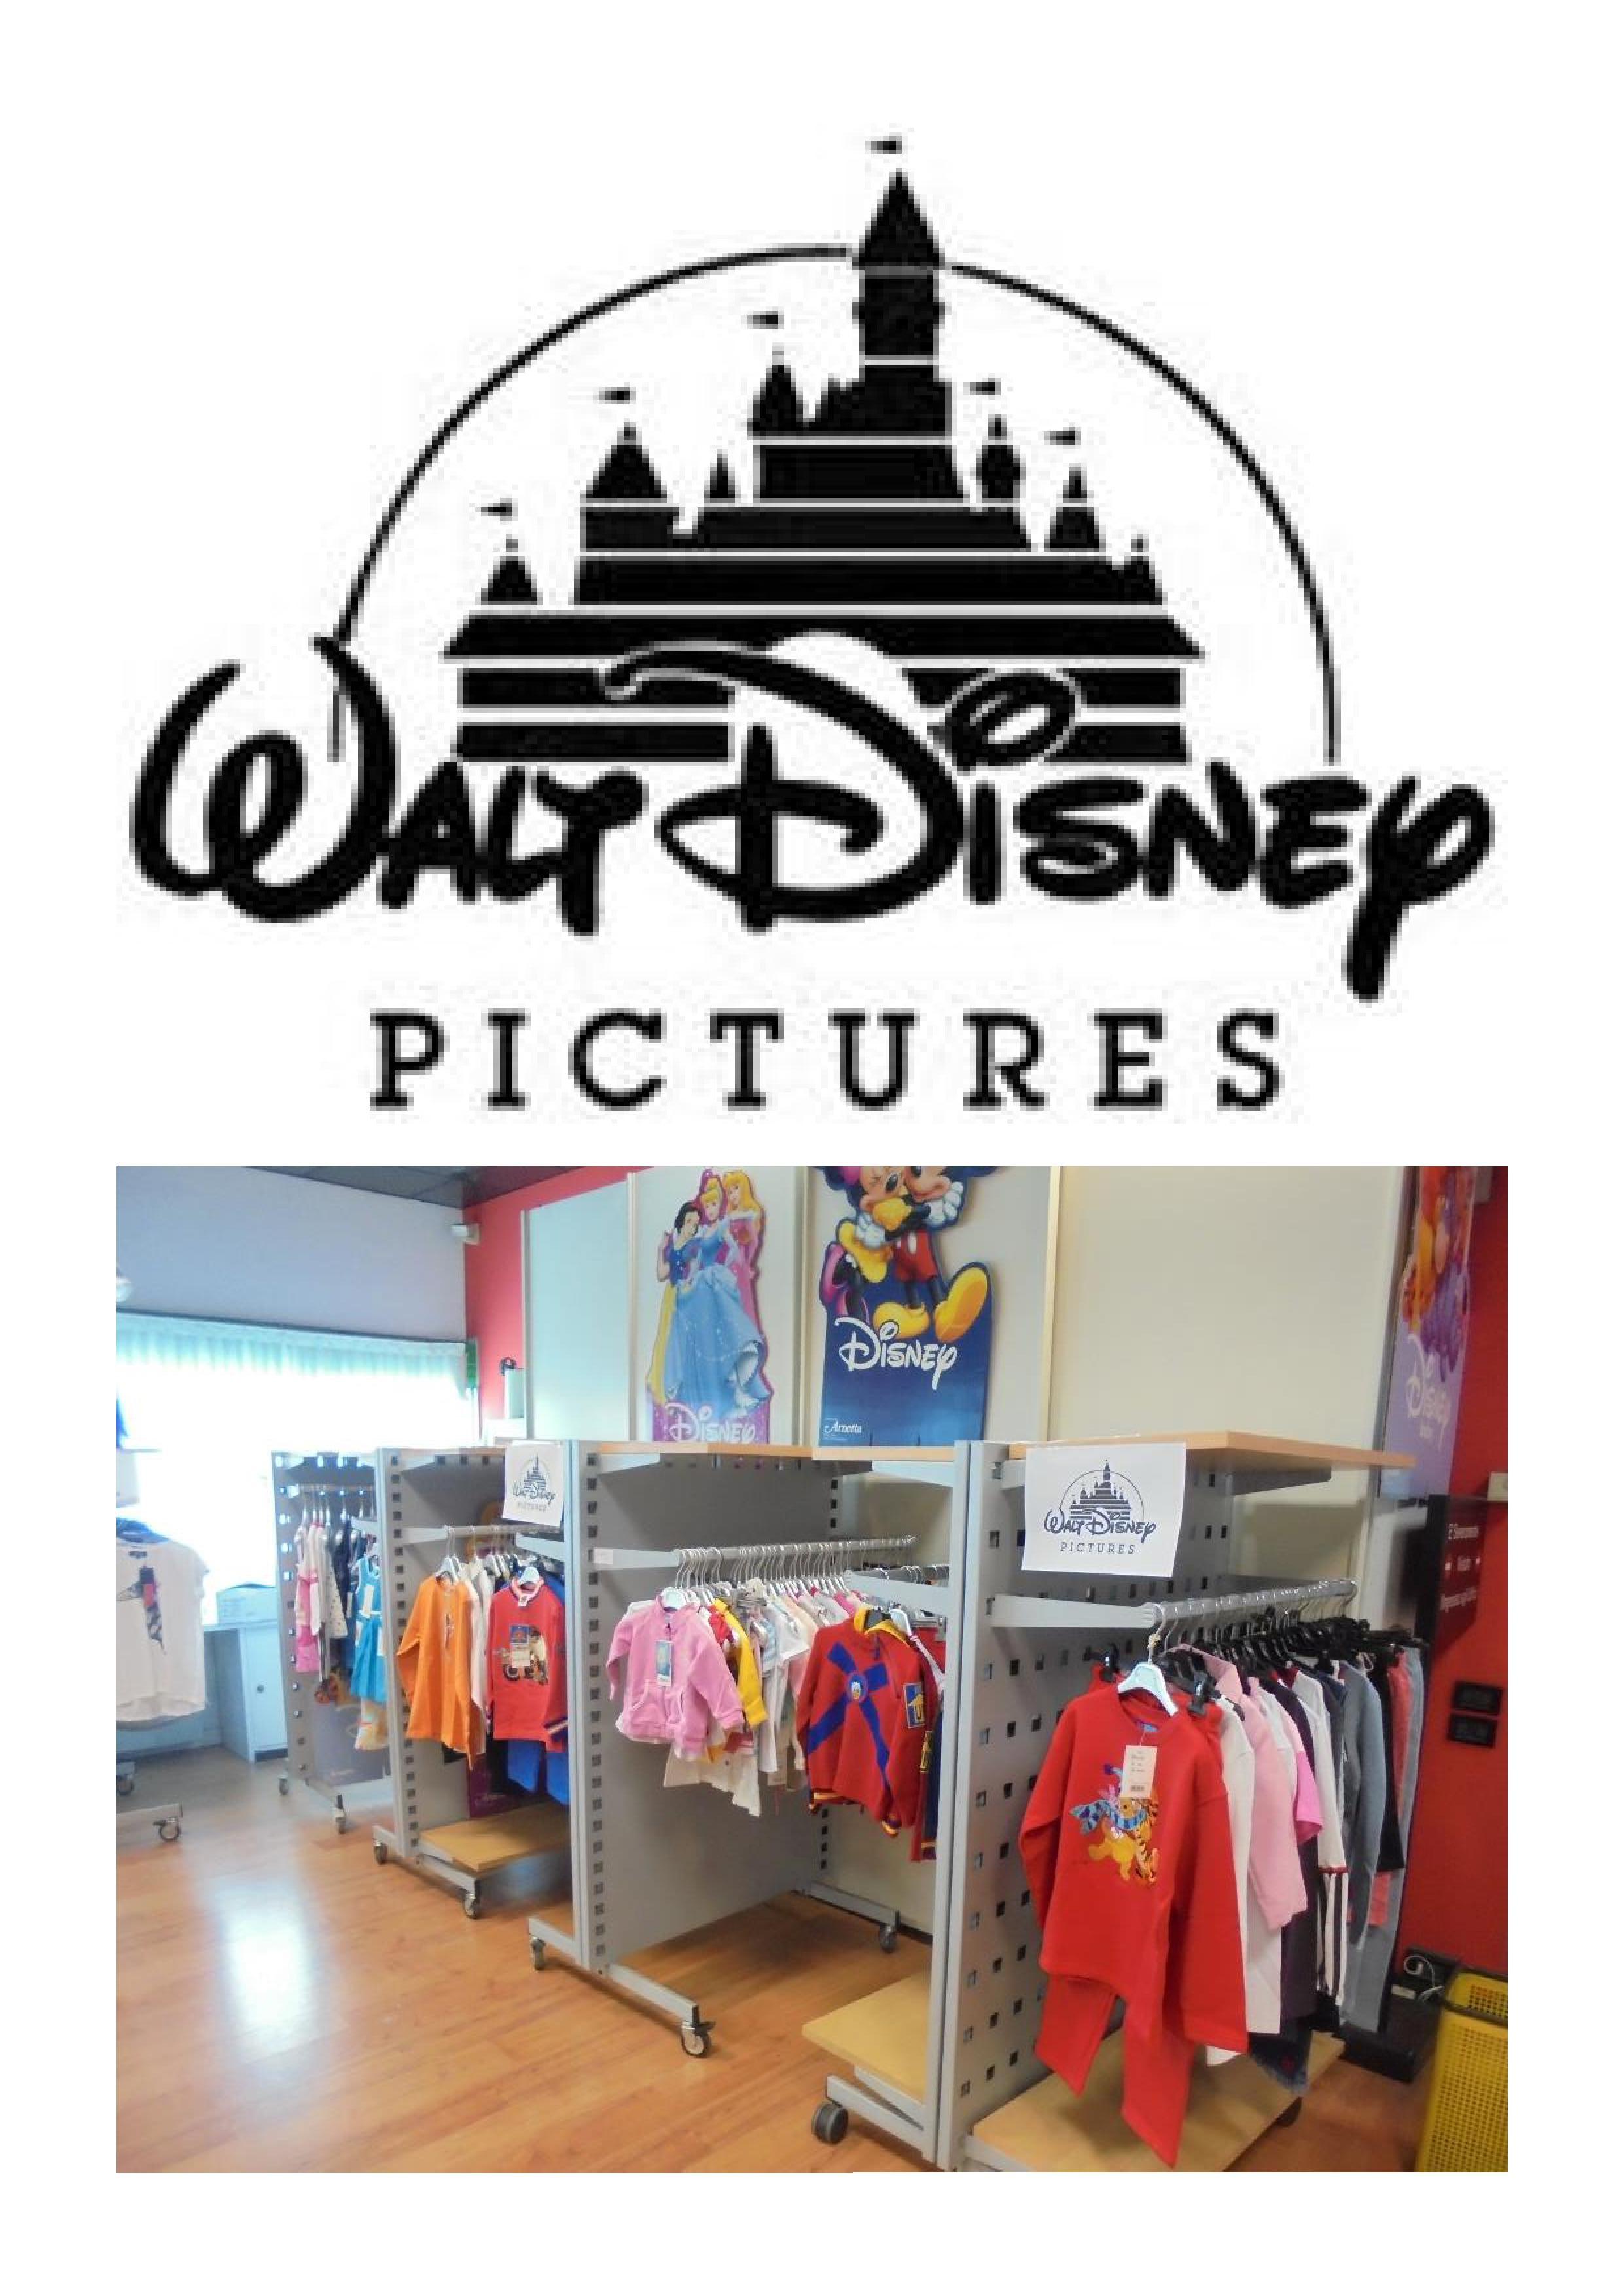 15c6bae2f79f Stocklot Disney Clothing - Stock Italy Srl